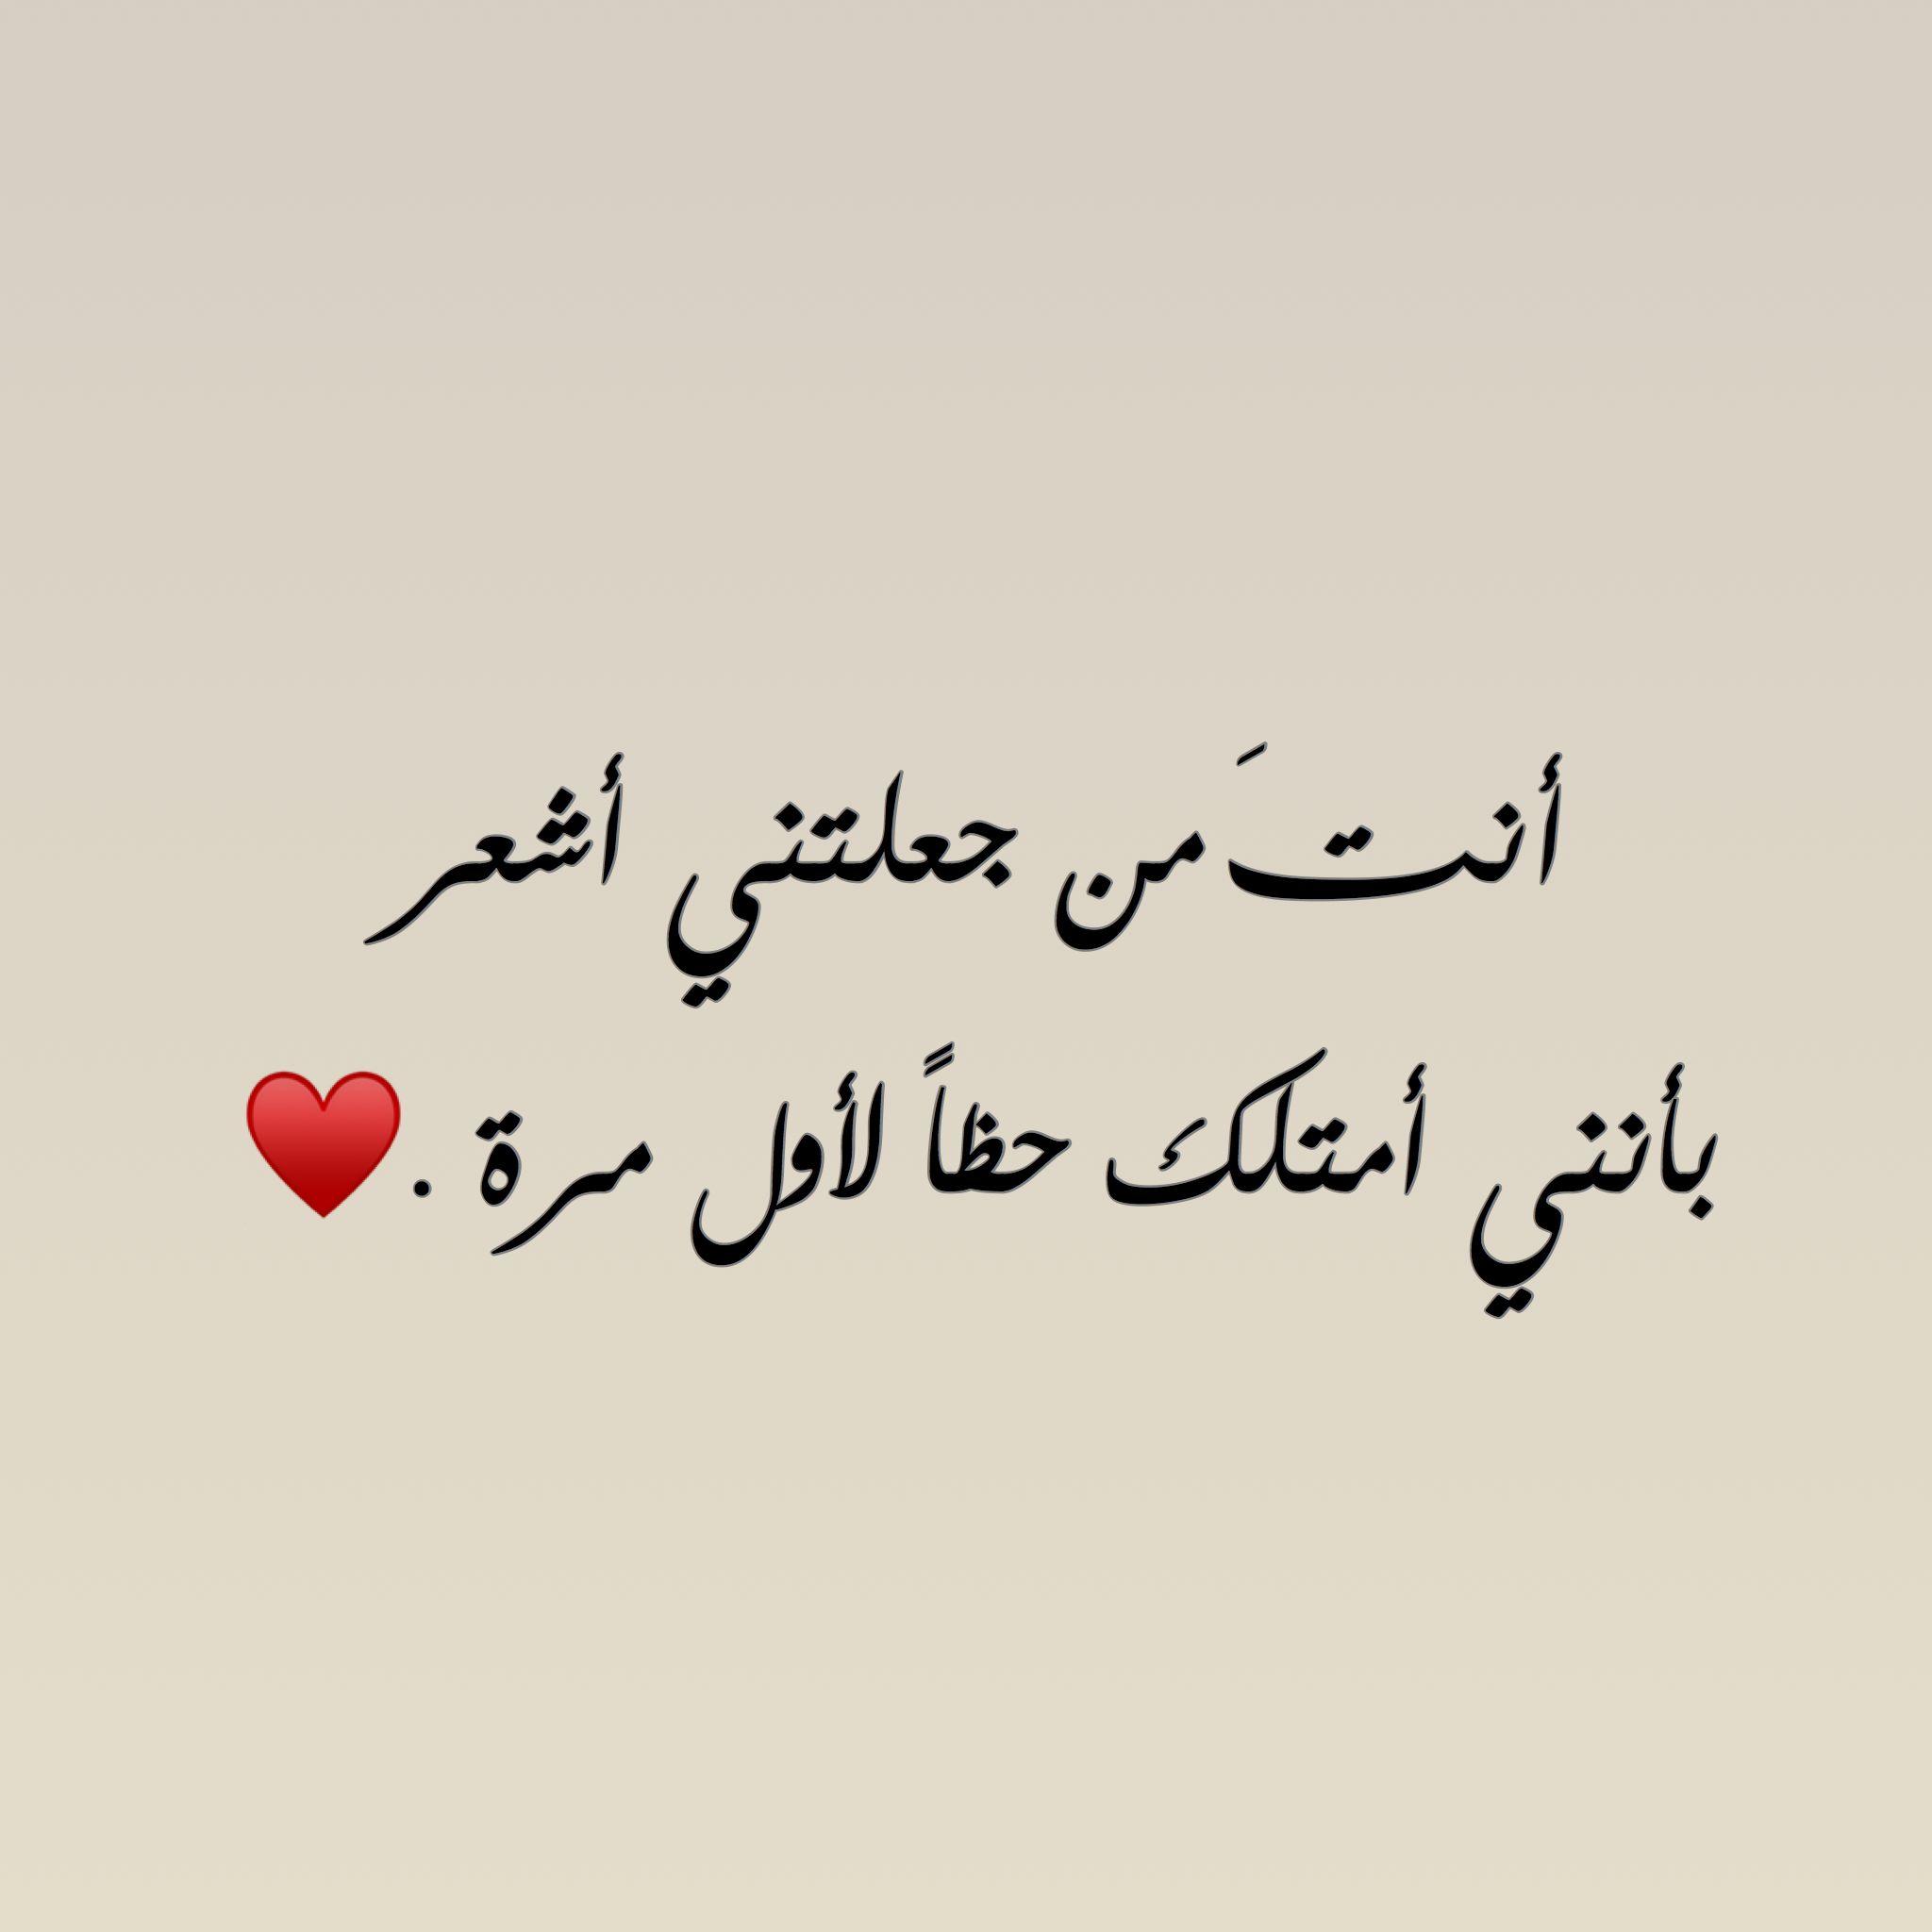 فعلاا ل اول مره Simple Love Quotes Romantic Words Arabic Love Quotes